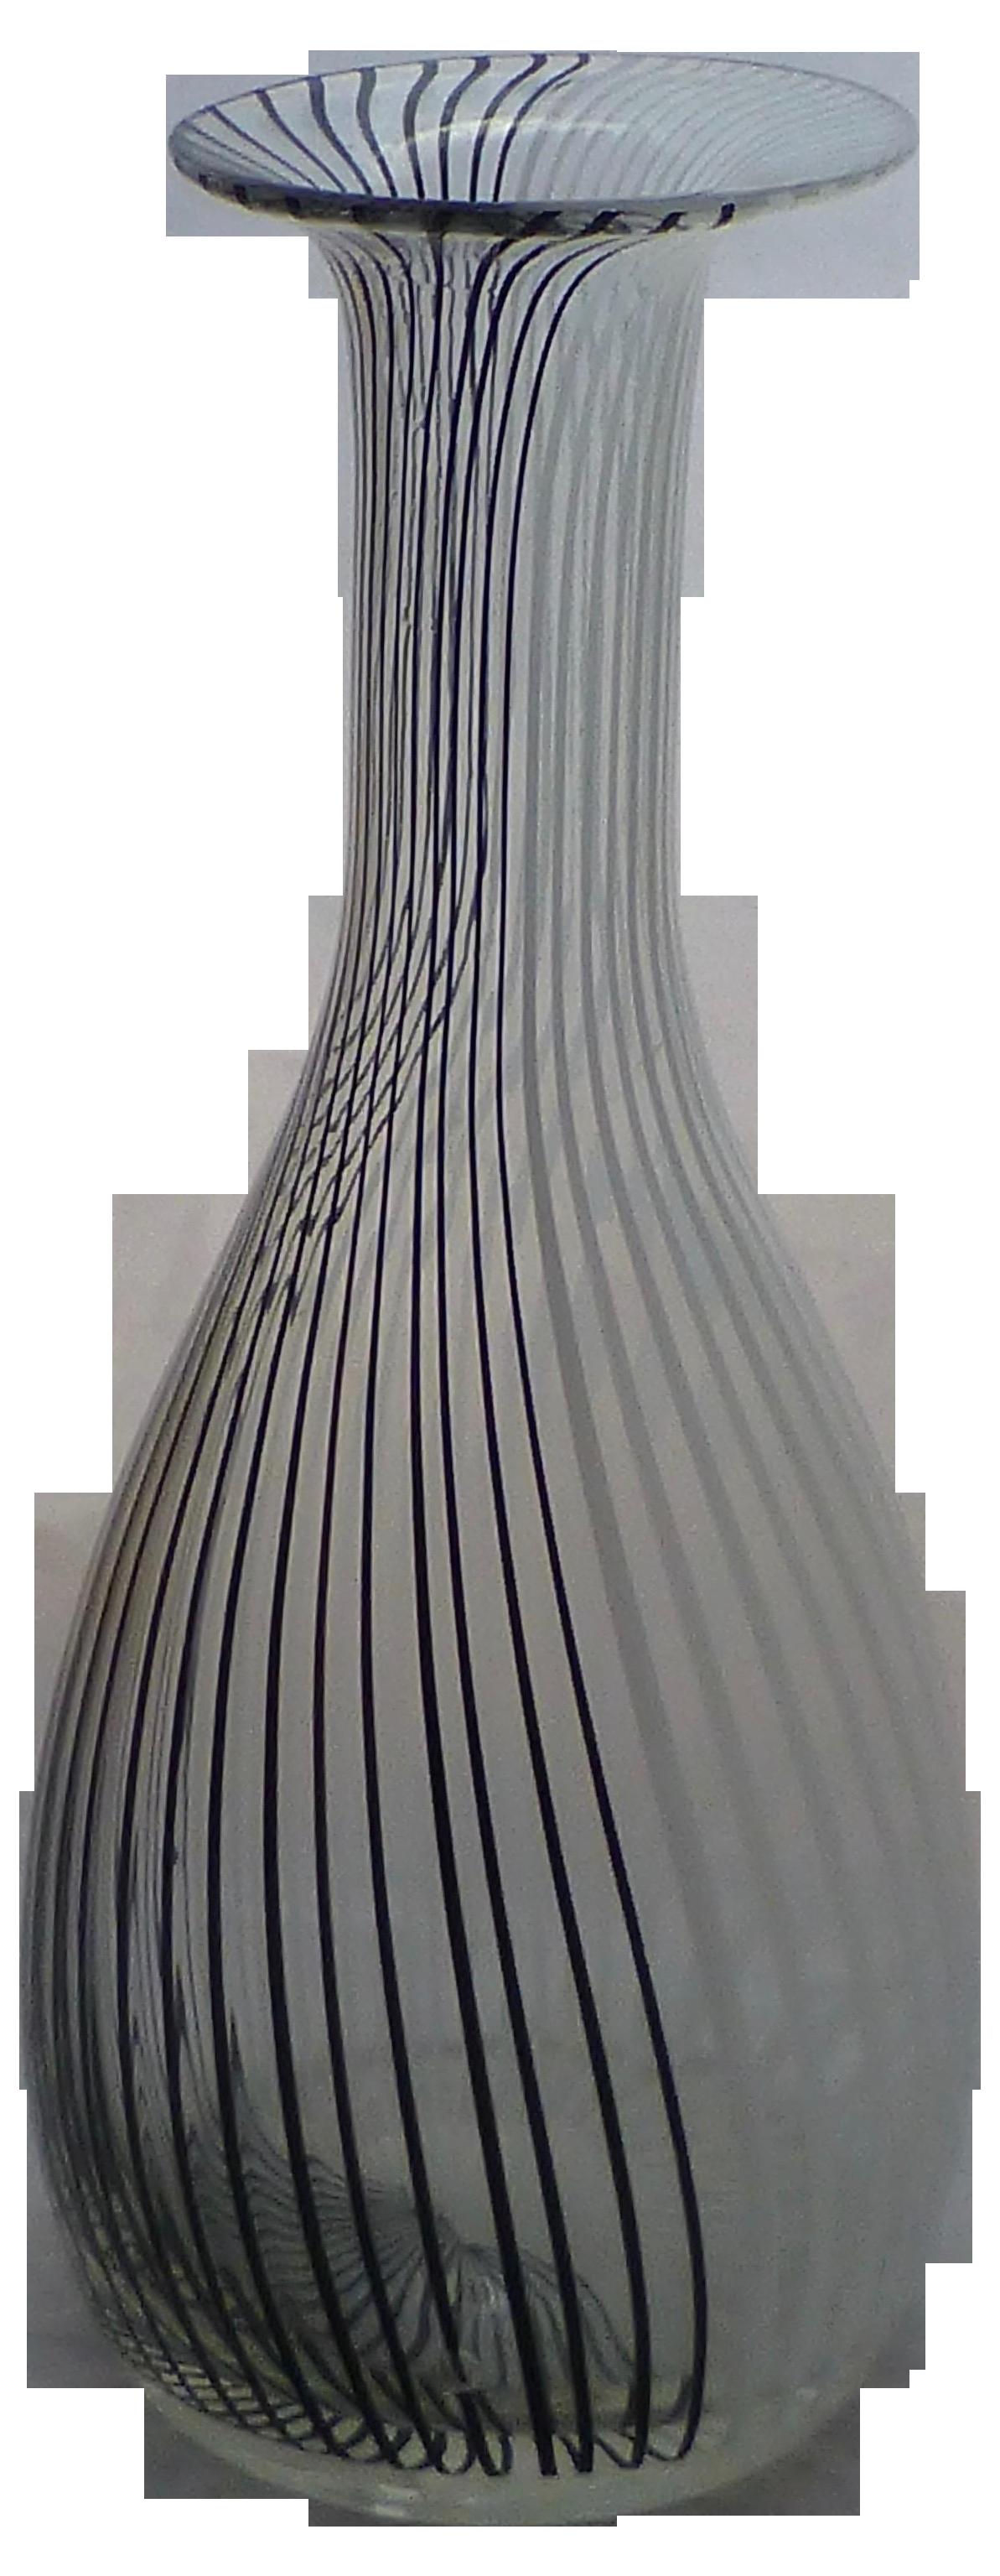 Murano Glass Black Amp White Striped Vase By Venini Chairish